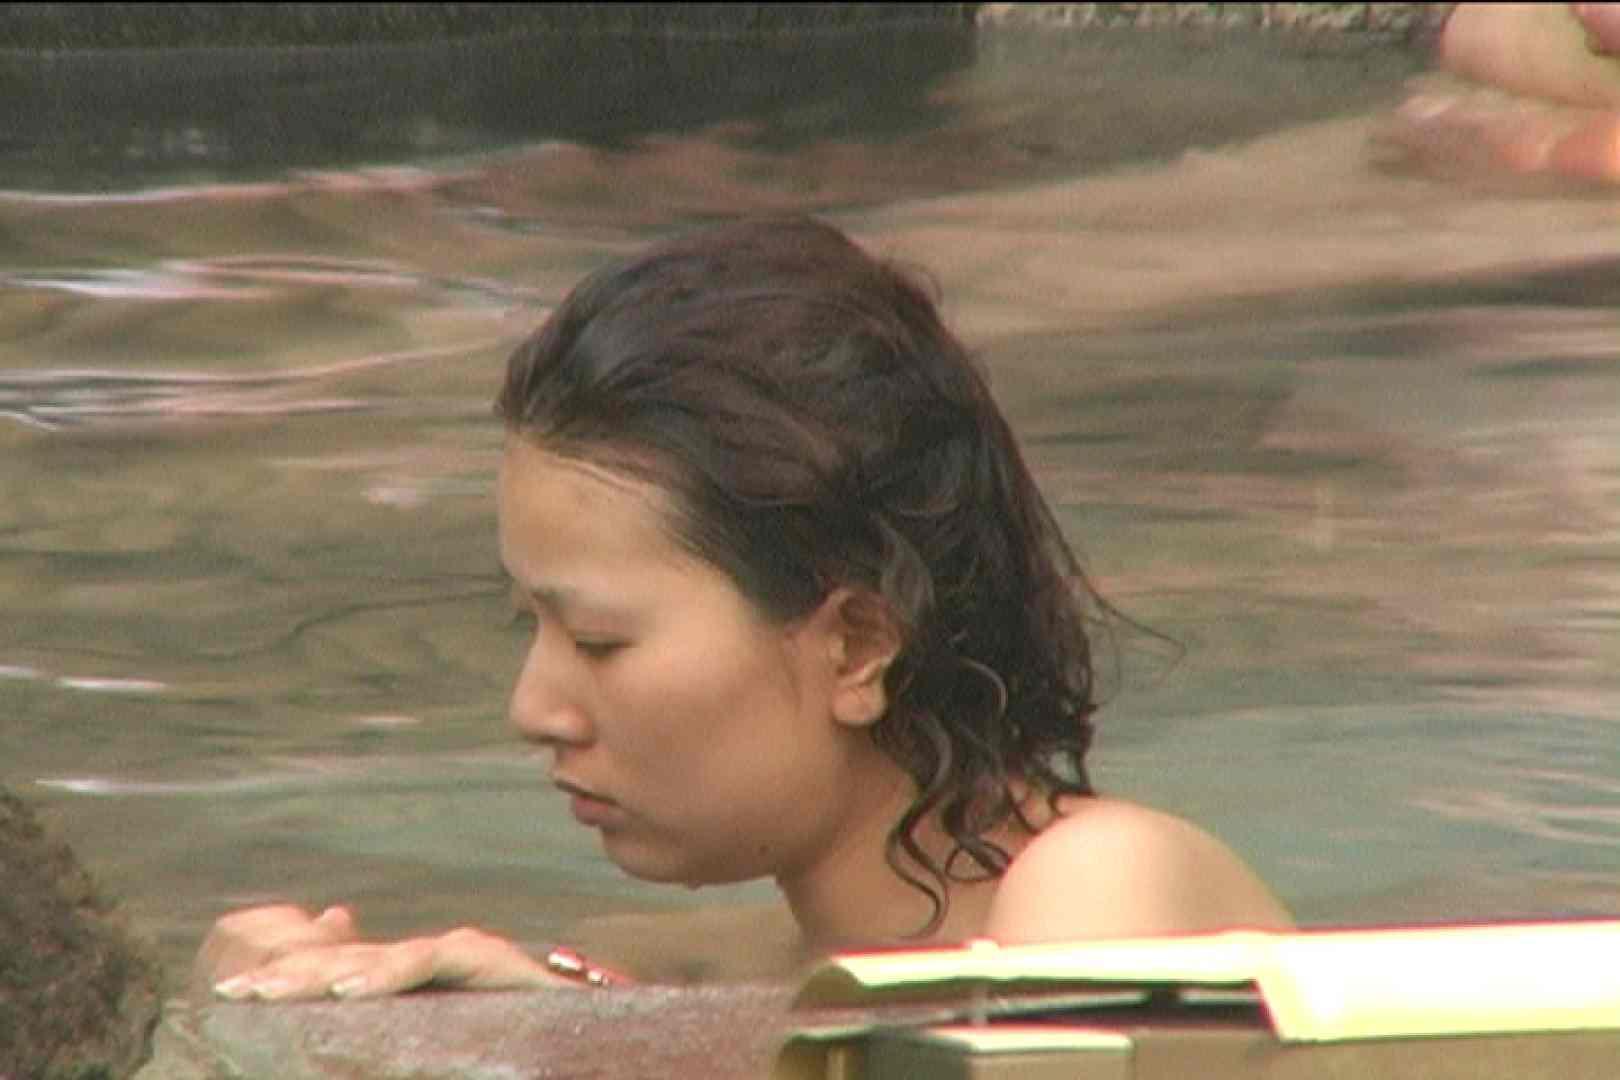 Aquaな露天風呂Vol.131 盗撮 AV動画キャプチャ 90枚 41